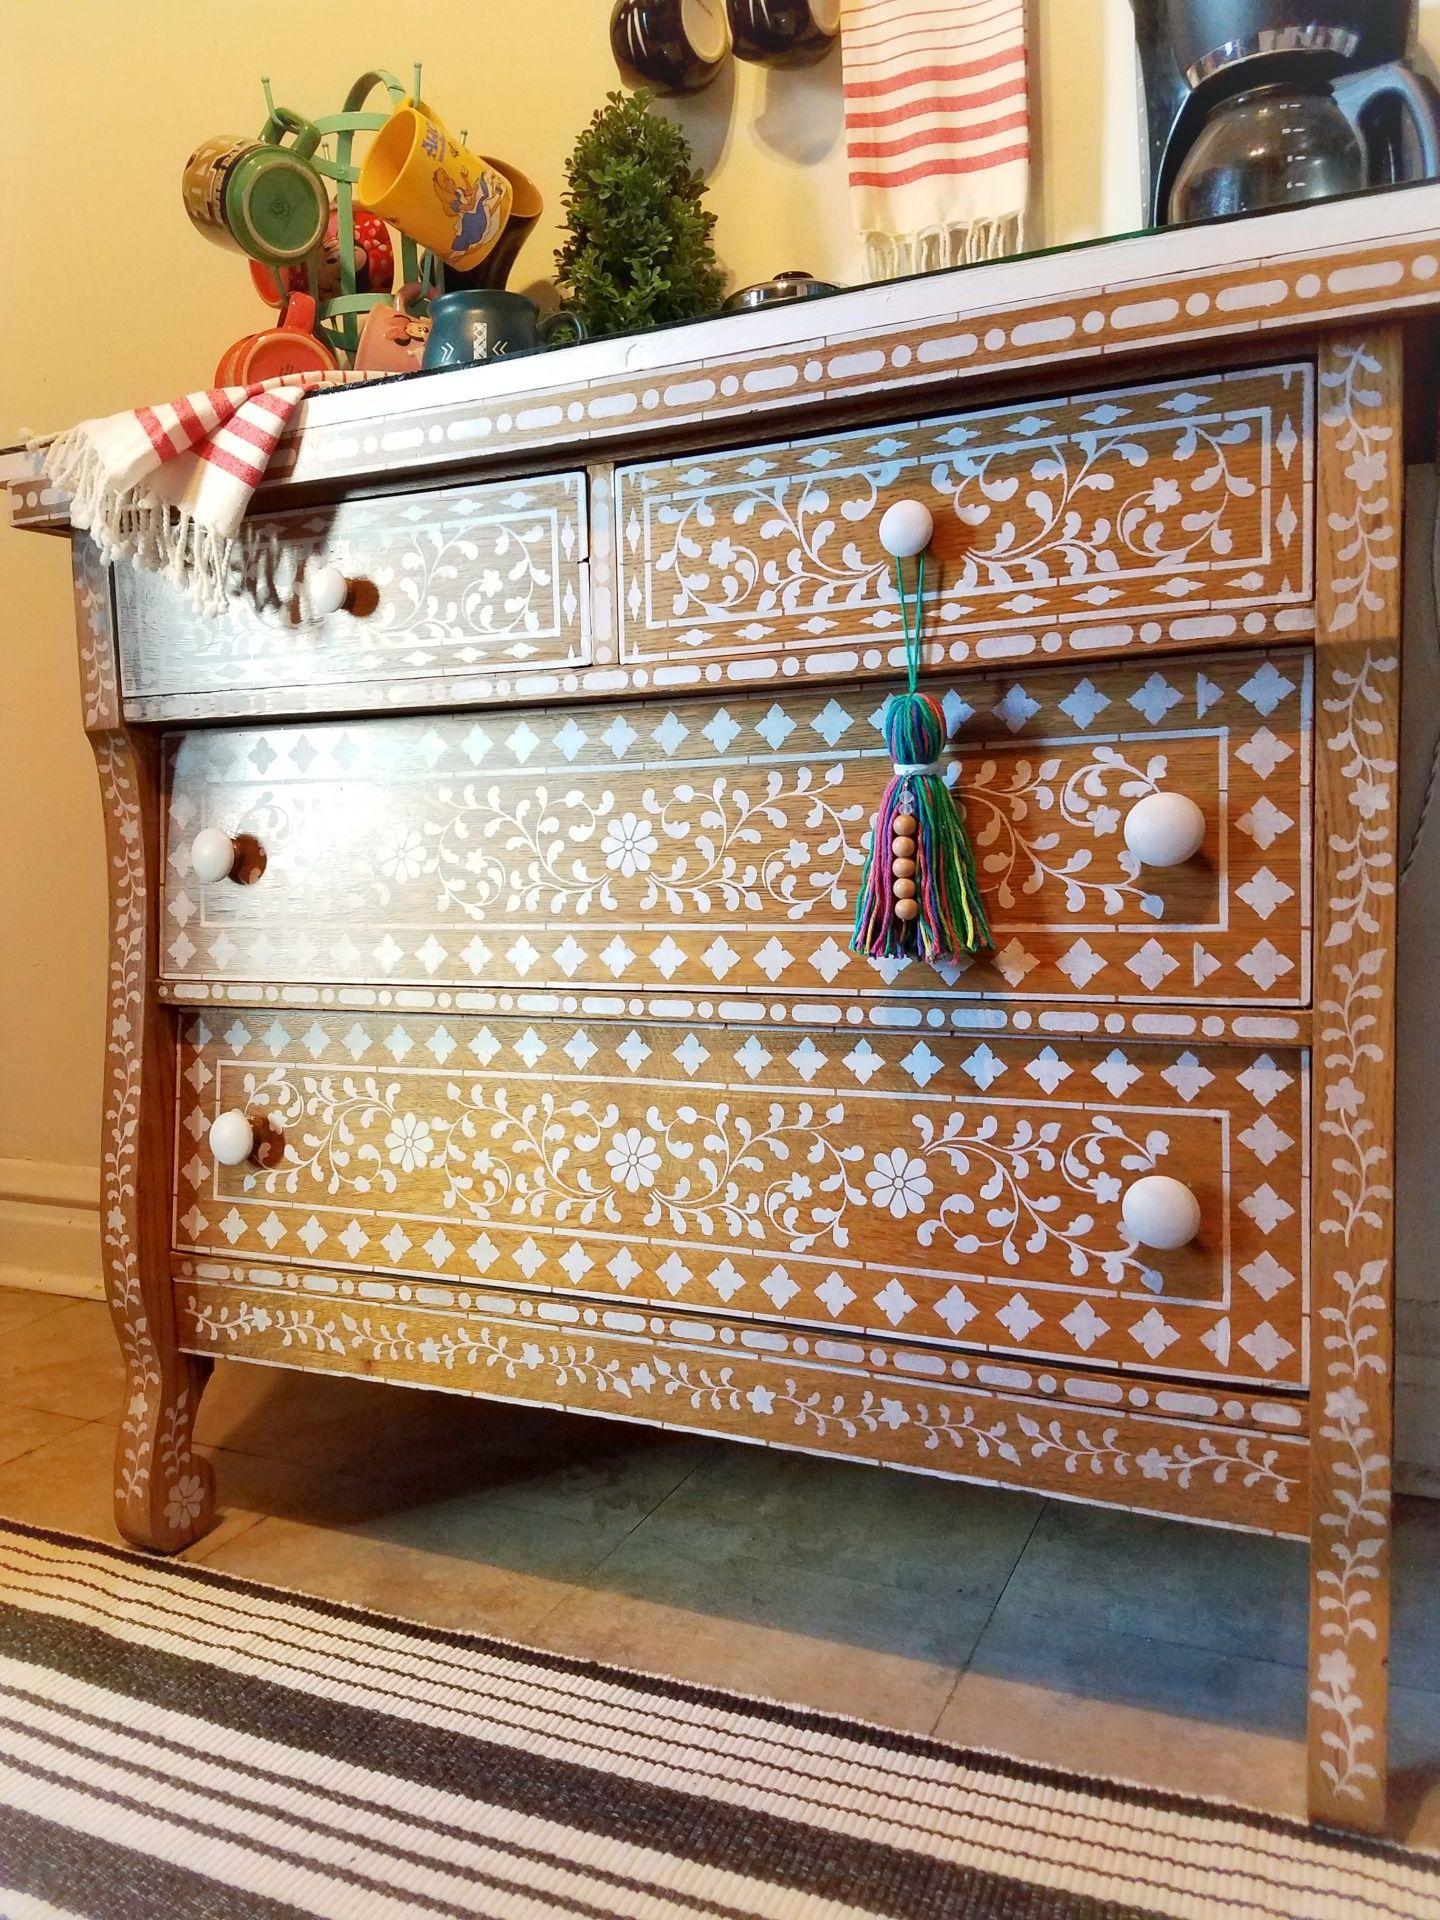 A DIY bone inlay stenciled dresser using the Indian Inlay